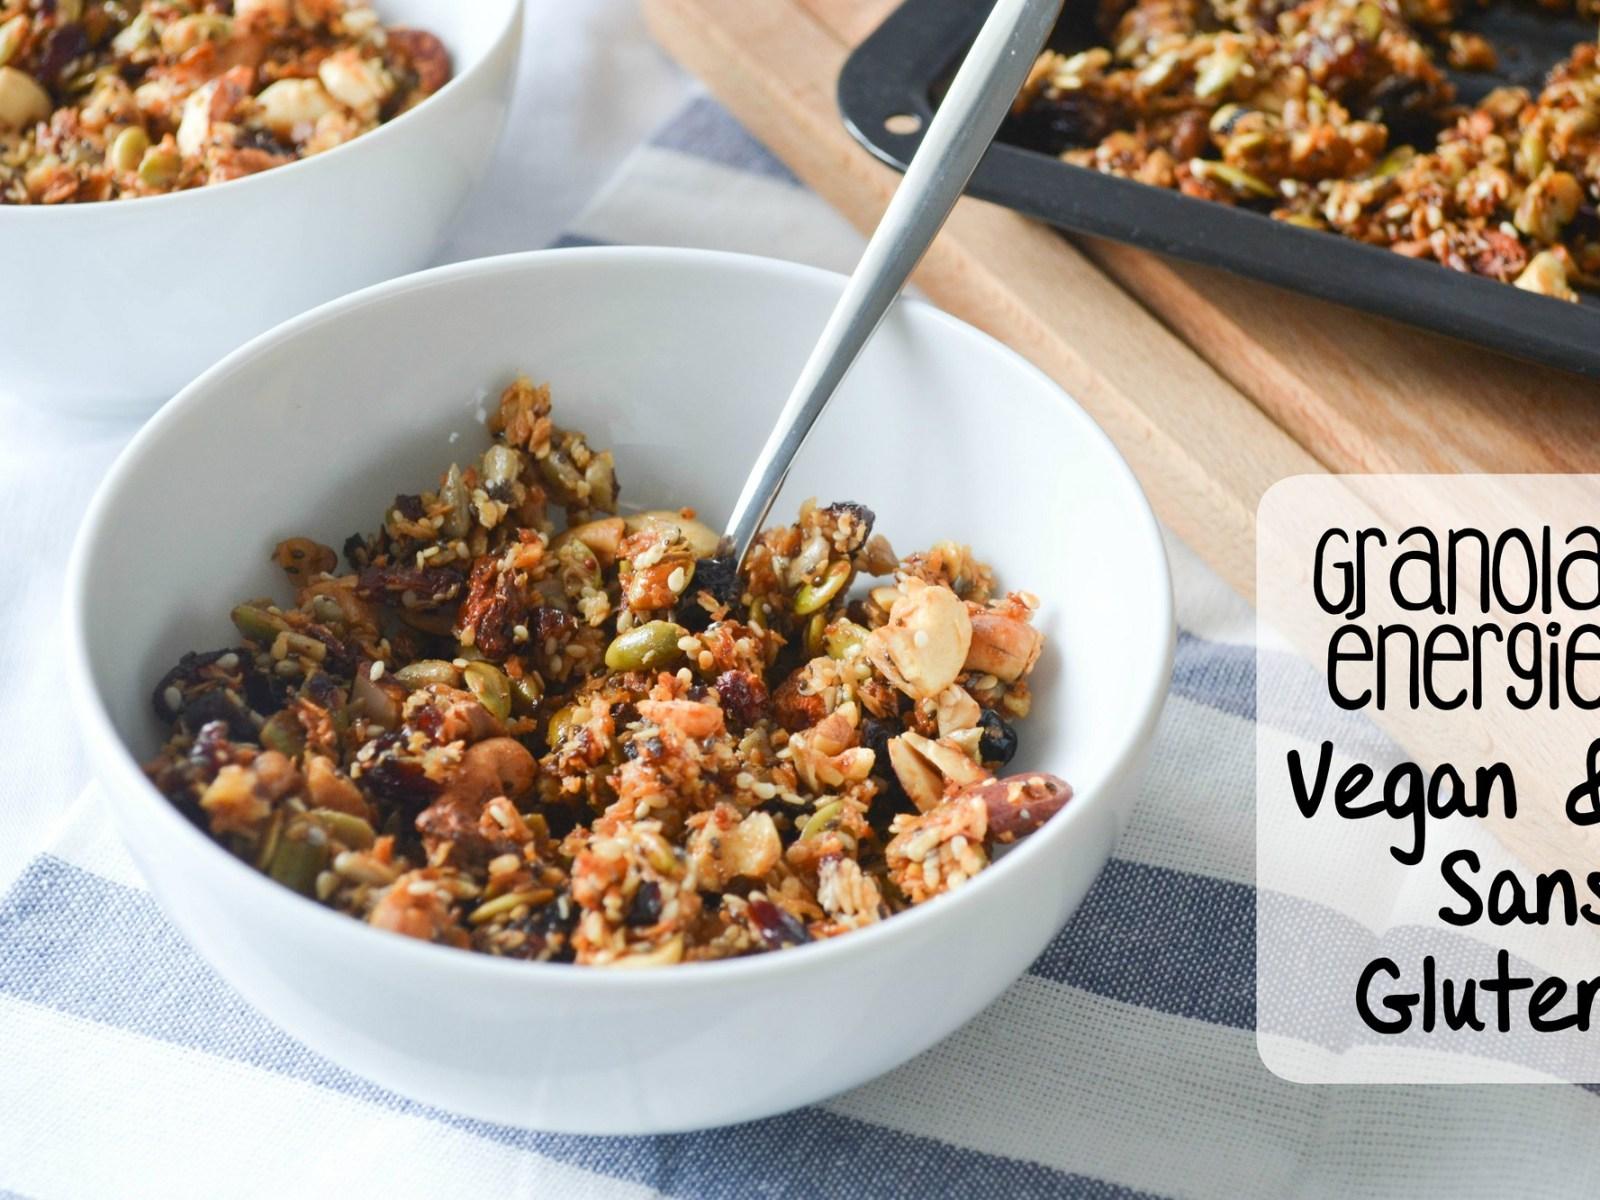 Granola vegan & sans gluten